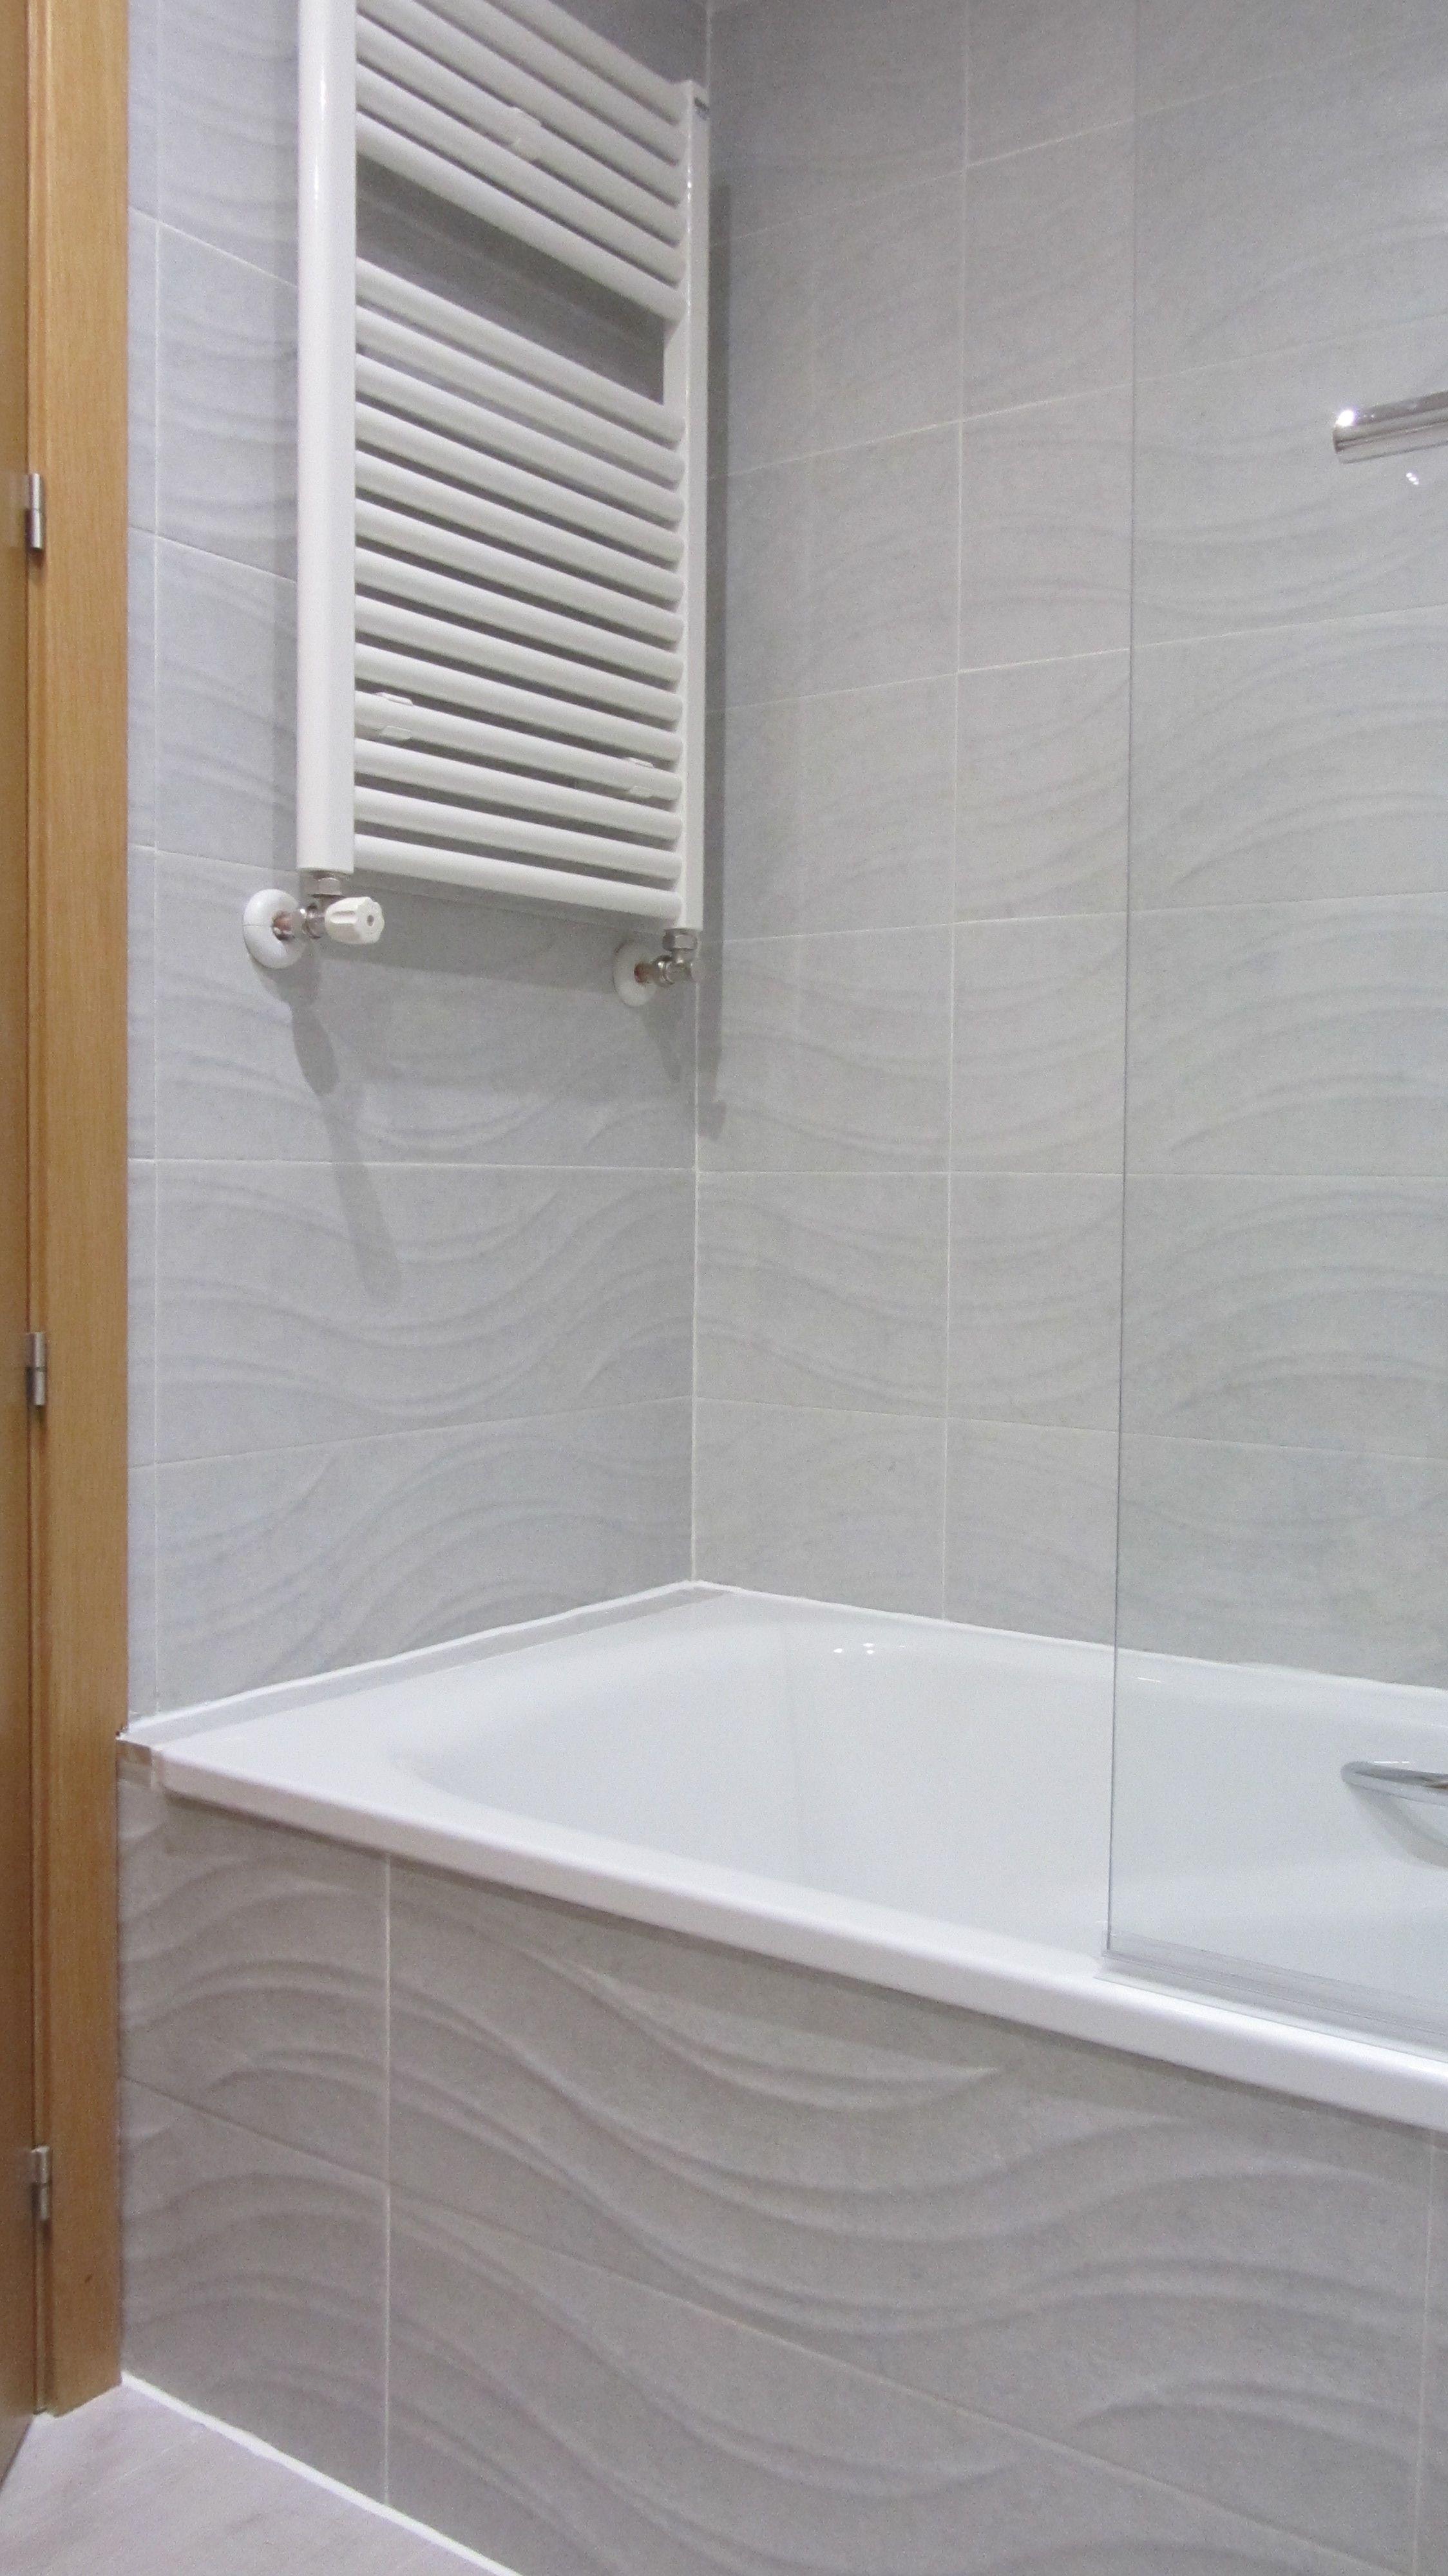 Radiador toallero tubular de chapa de acero lacado en - Radiador electrico bano ...